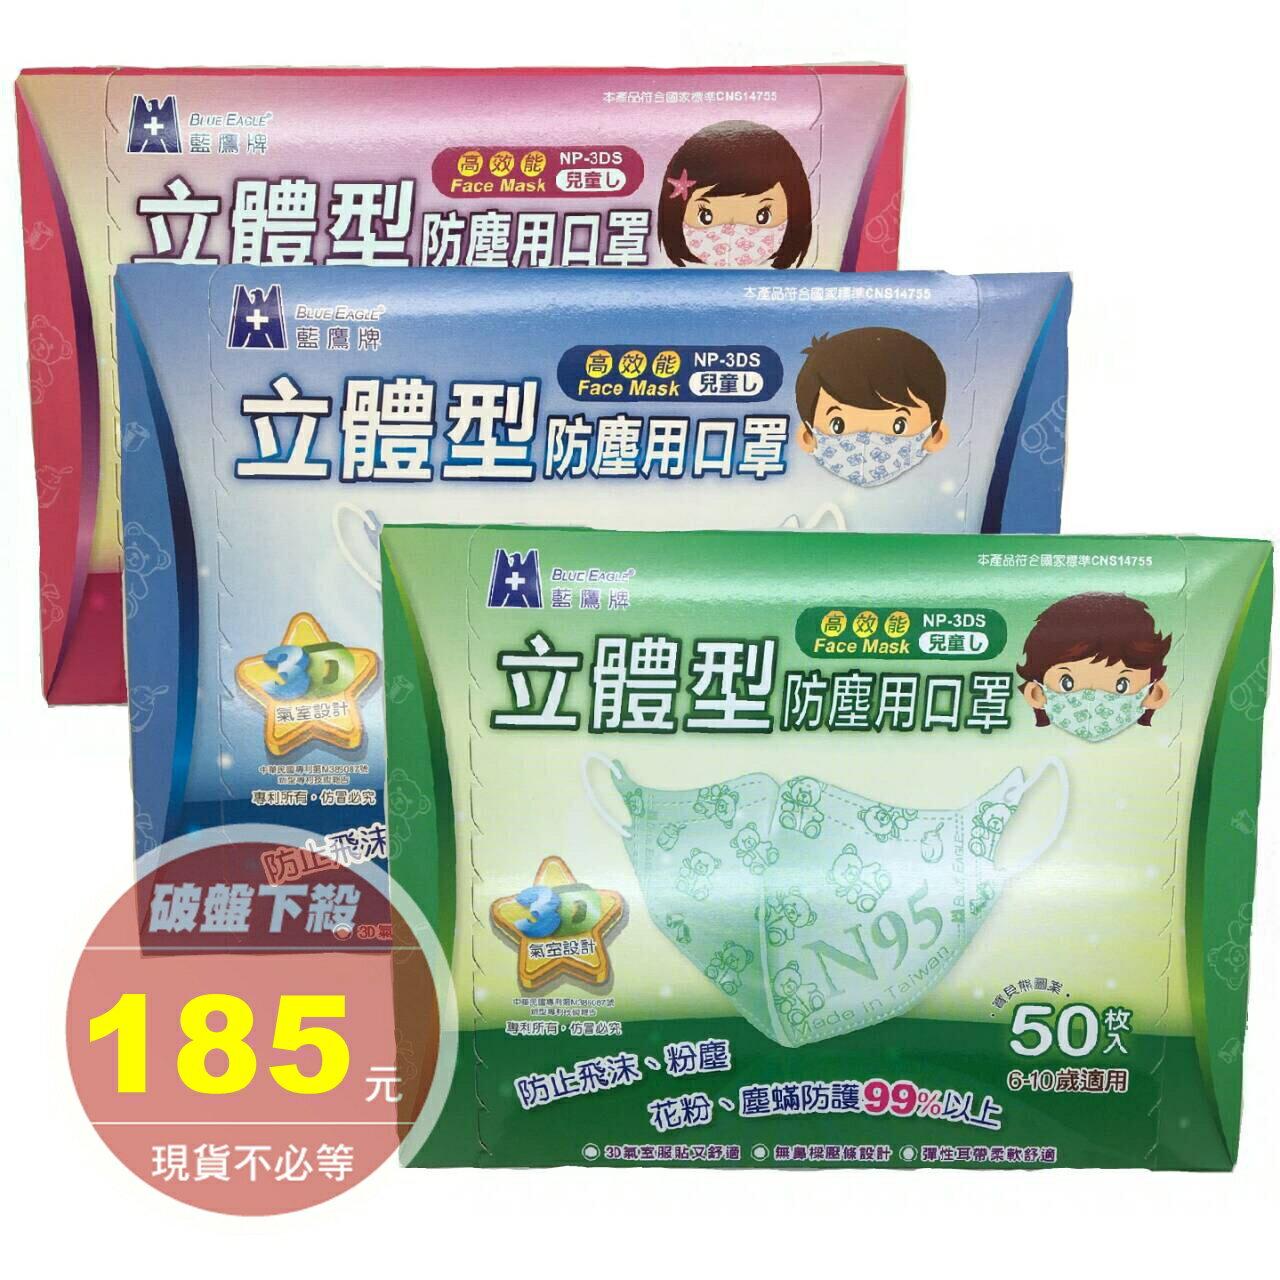 (mina百貨)【藍鷹牌】台灣製 幼幼版 6-10歲適用 3D立體口罩